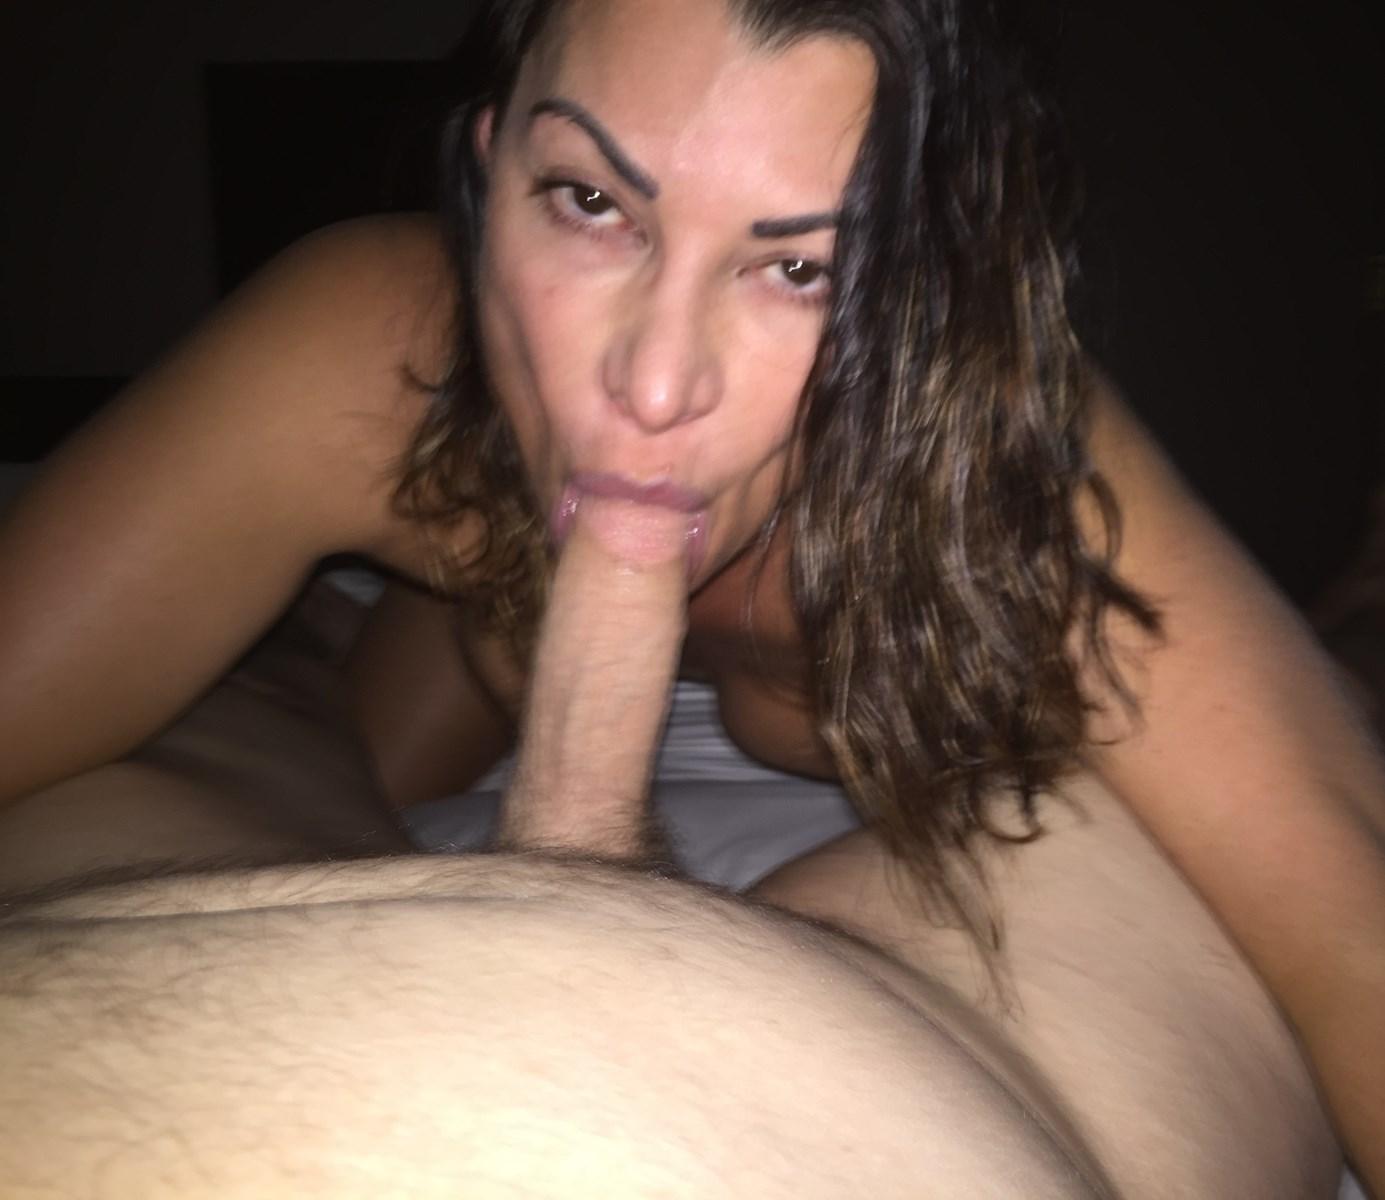 Wwe Diva Victoria nude